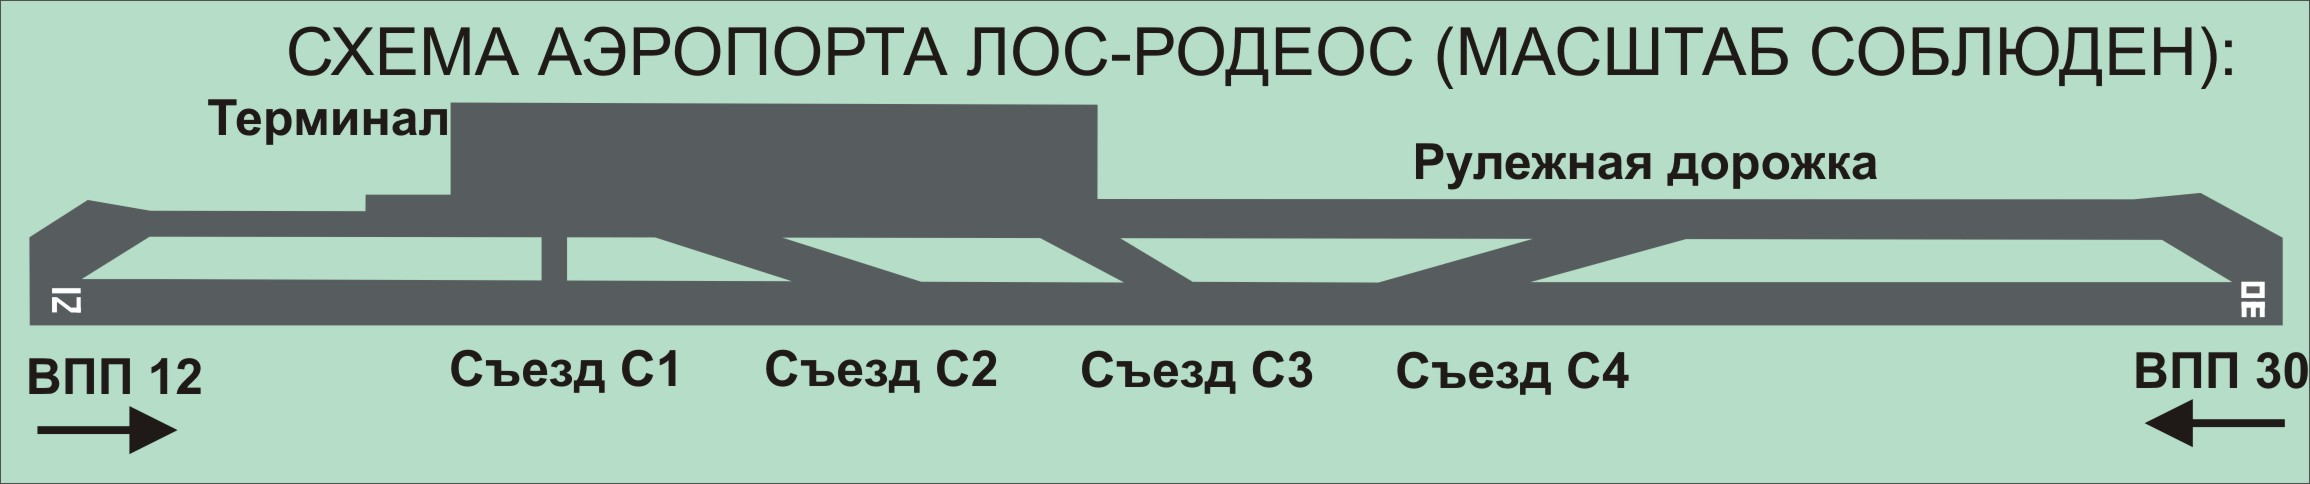 q3omgn45ou-vrr6yn-dfbxn8any.jpeg